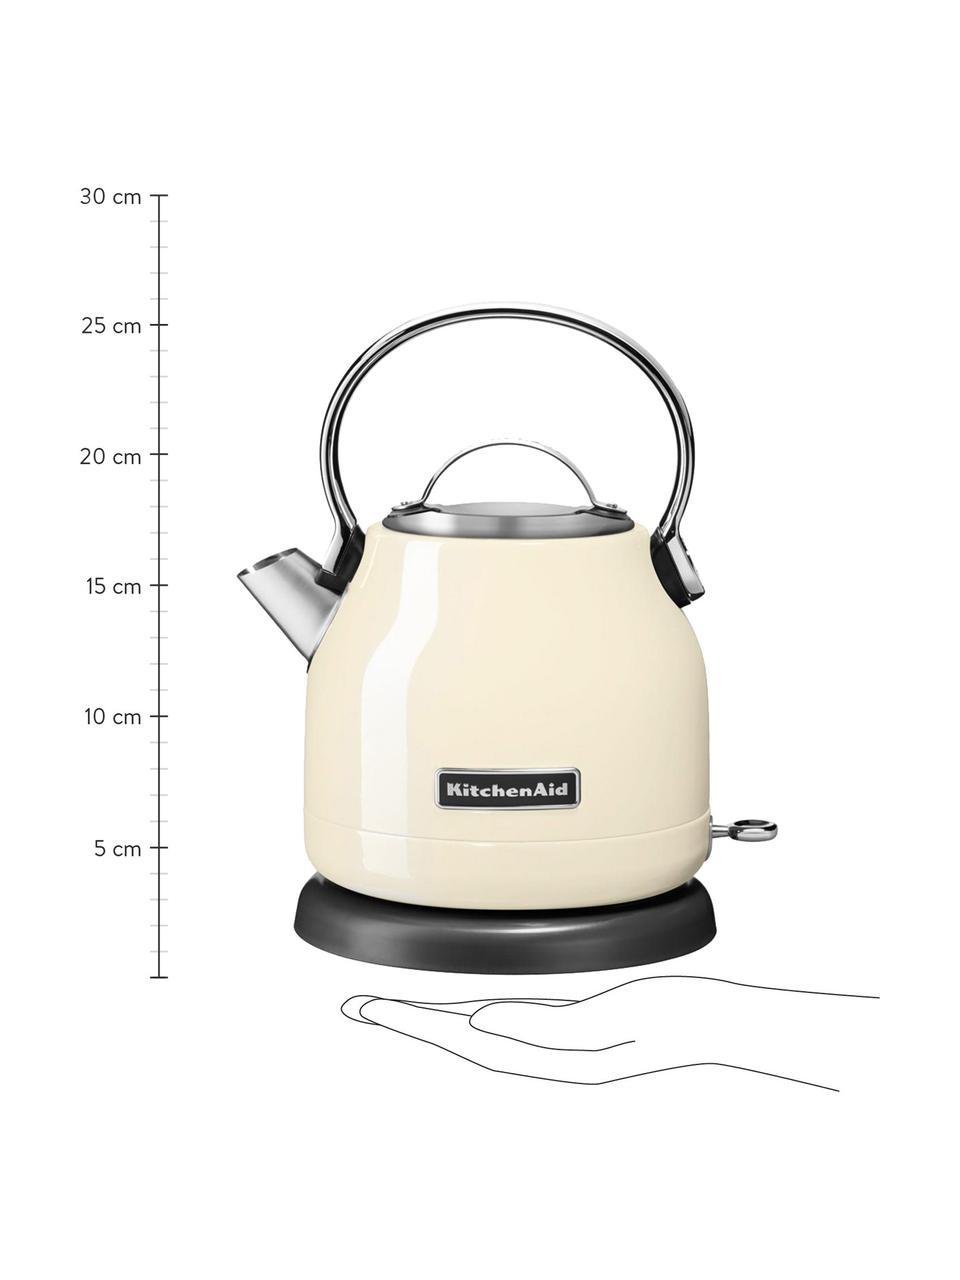 Bollitore elettrico KitchenAid, Acciaio inossidabile, Crema lucido, Larg. 23 x Alt. 26 cm